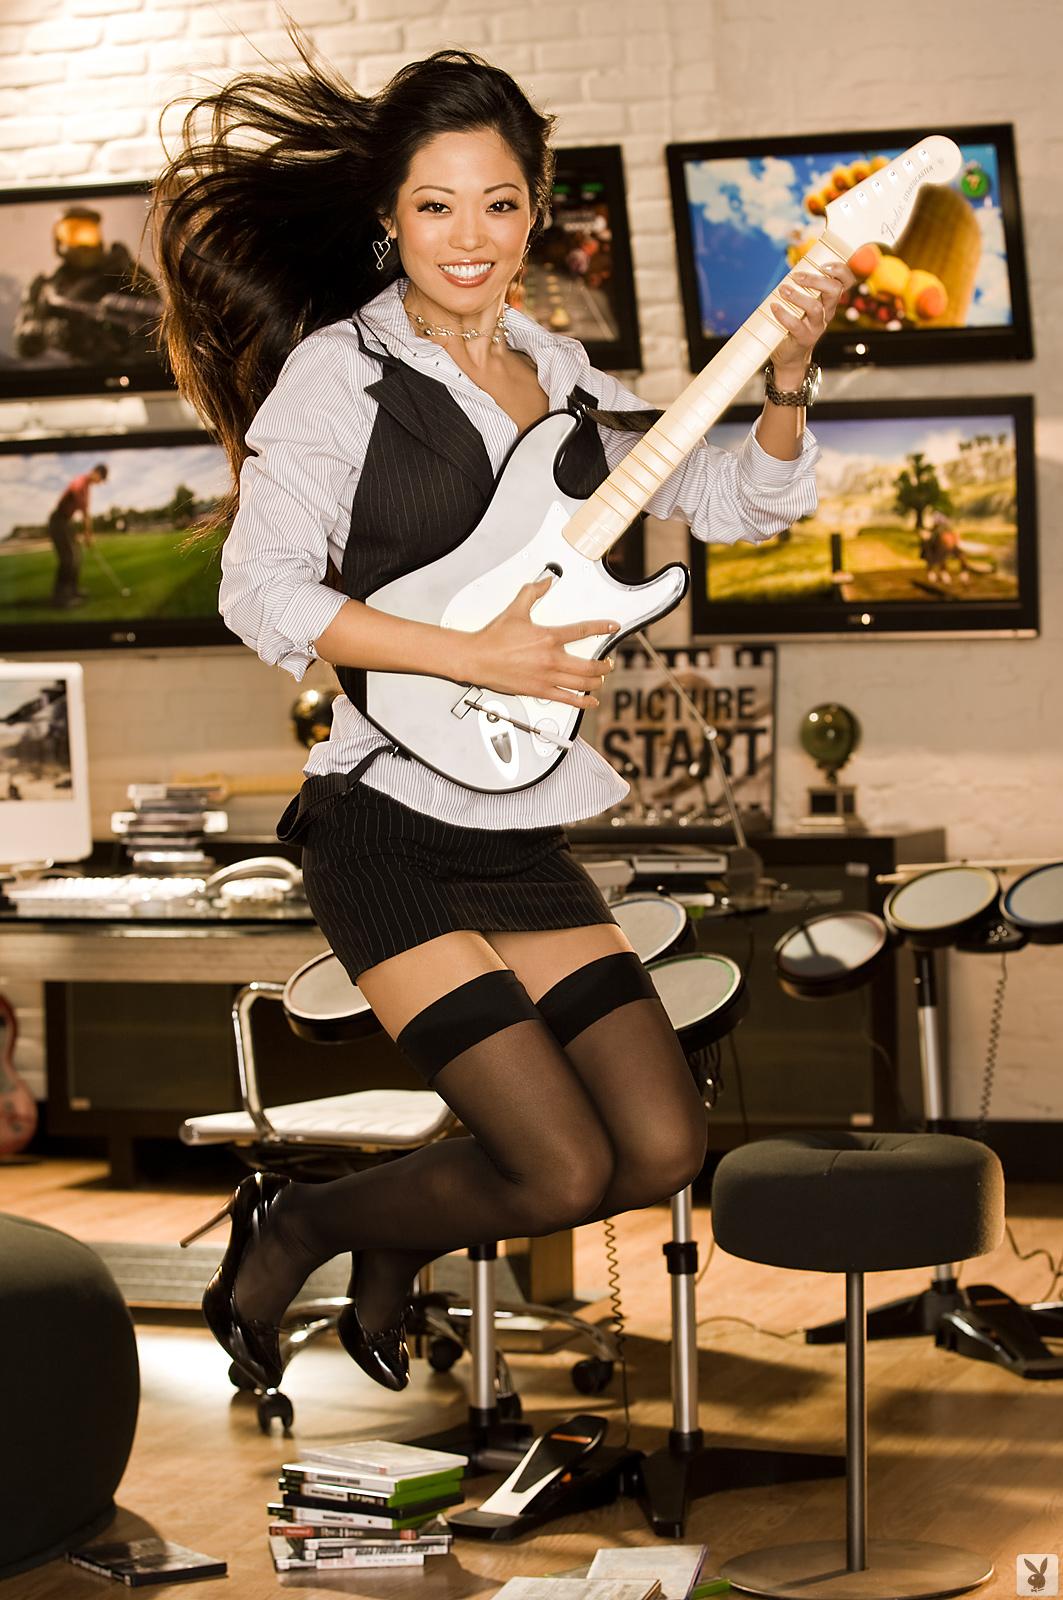 grace-kim-guitar-stockings-naked-asian-playboy-01